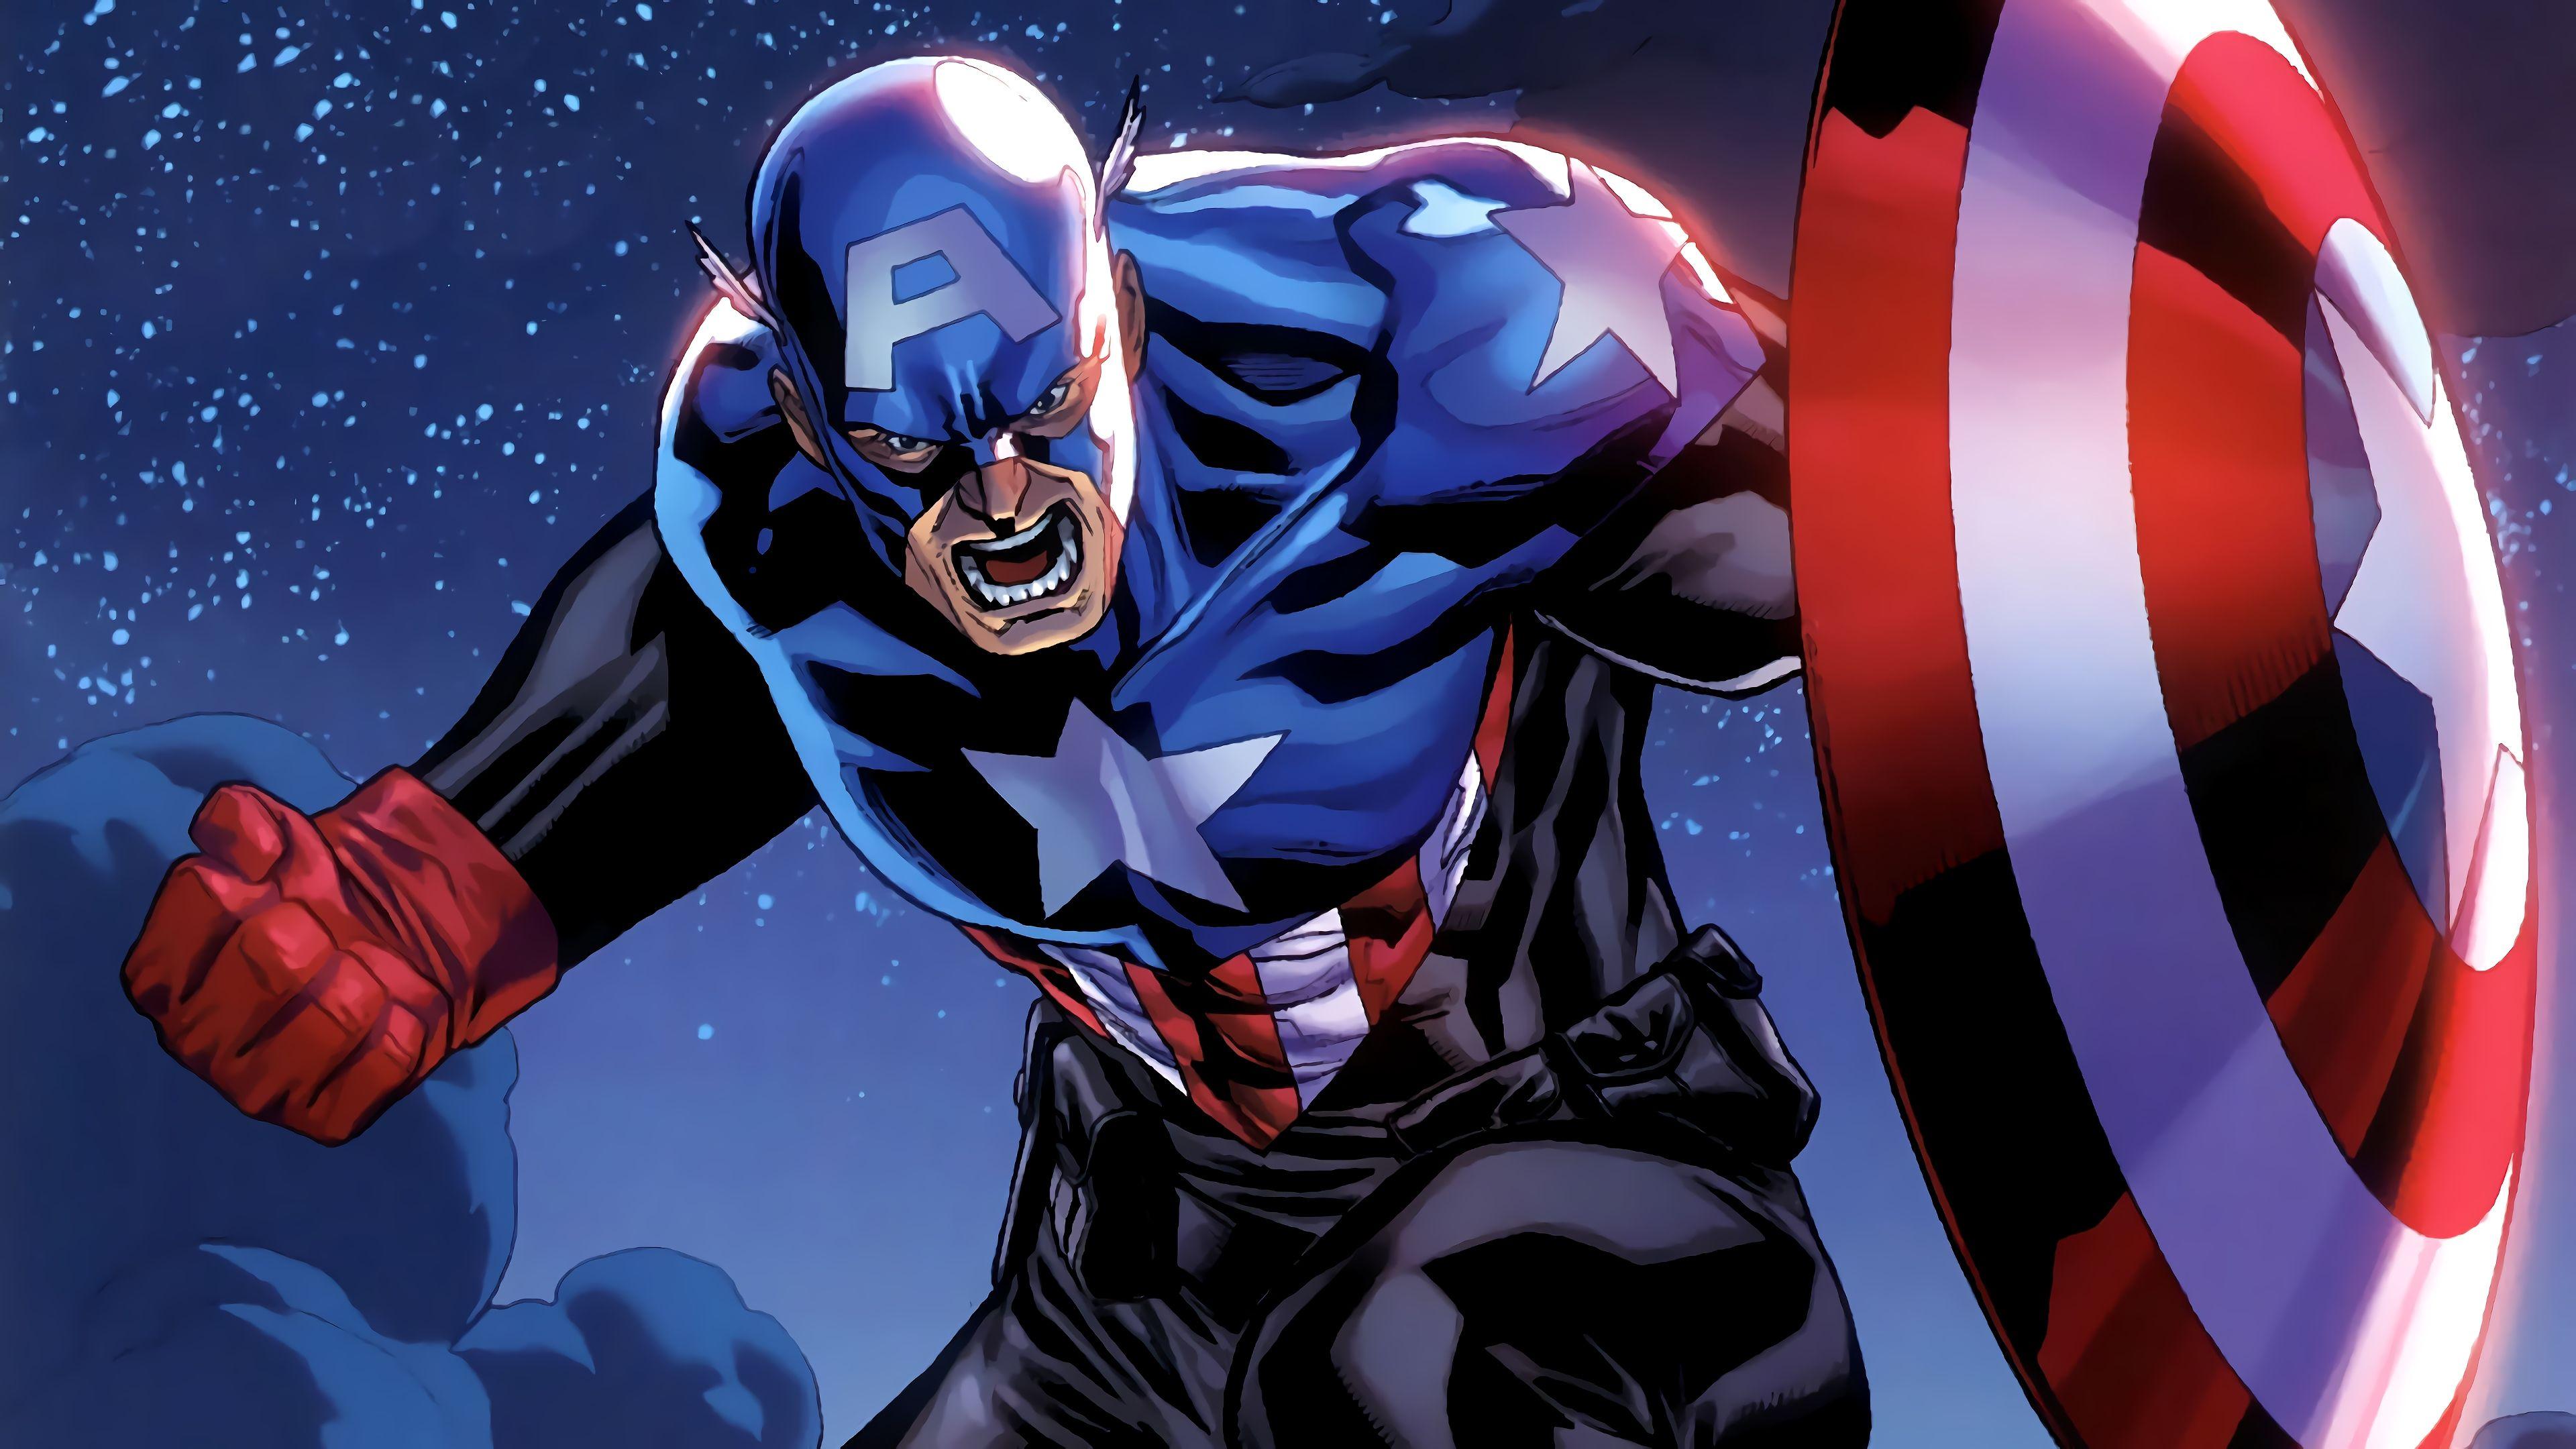 Wallpaper 4k Captain America Marvel Comics 4k Wallpaper Captain